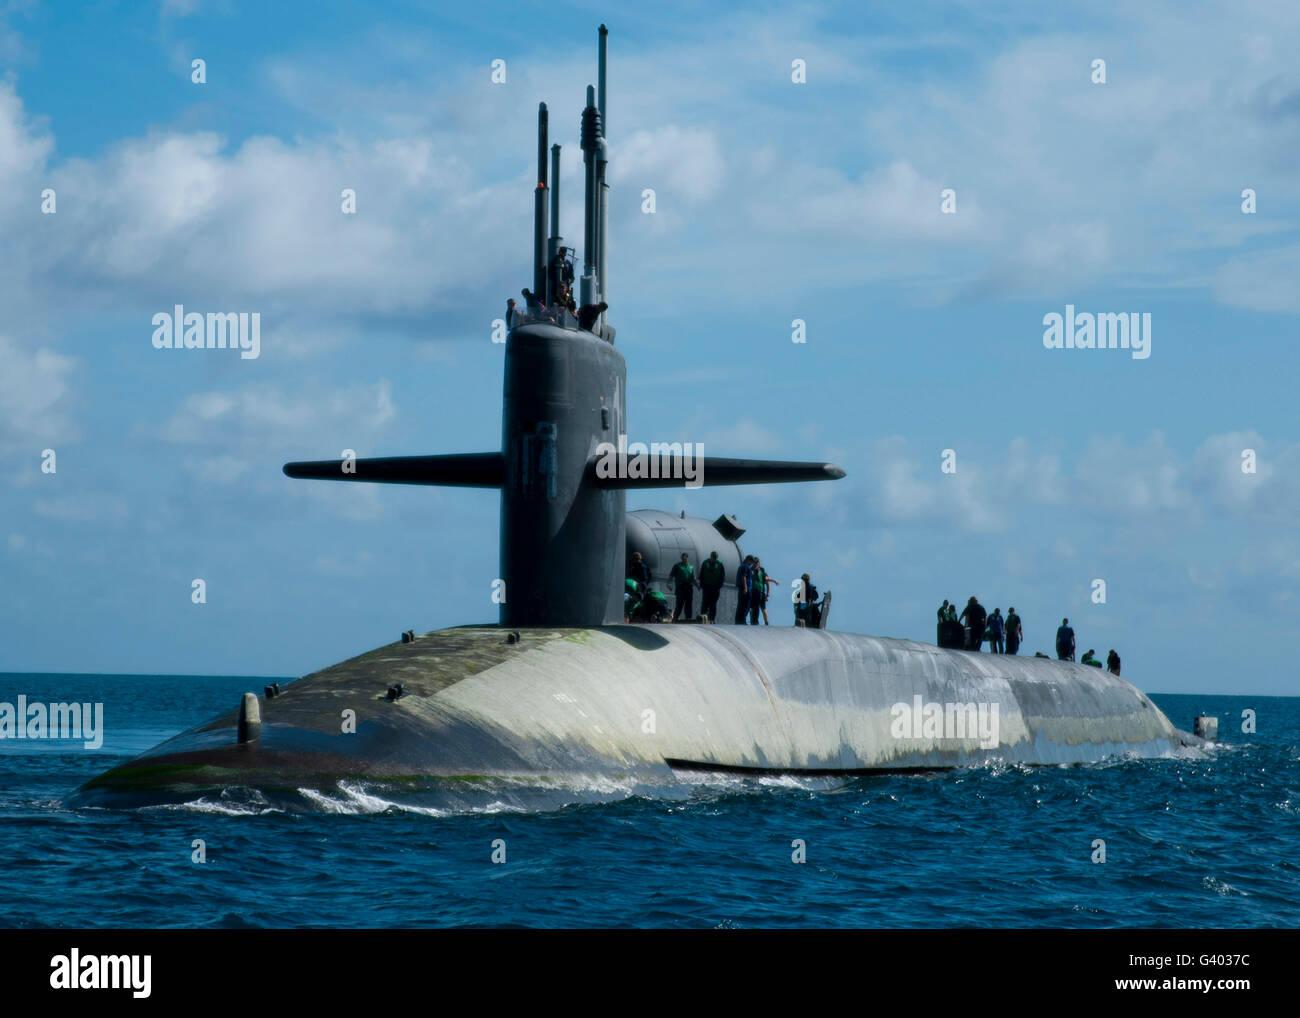 Sailors aboard the guided-missile submarine USS Georgia. - Stock Image